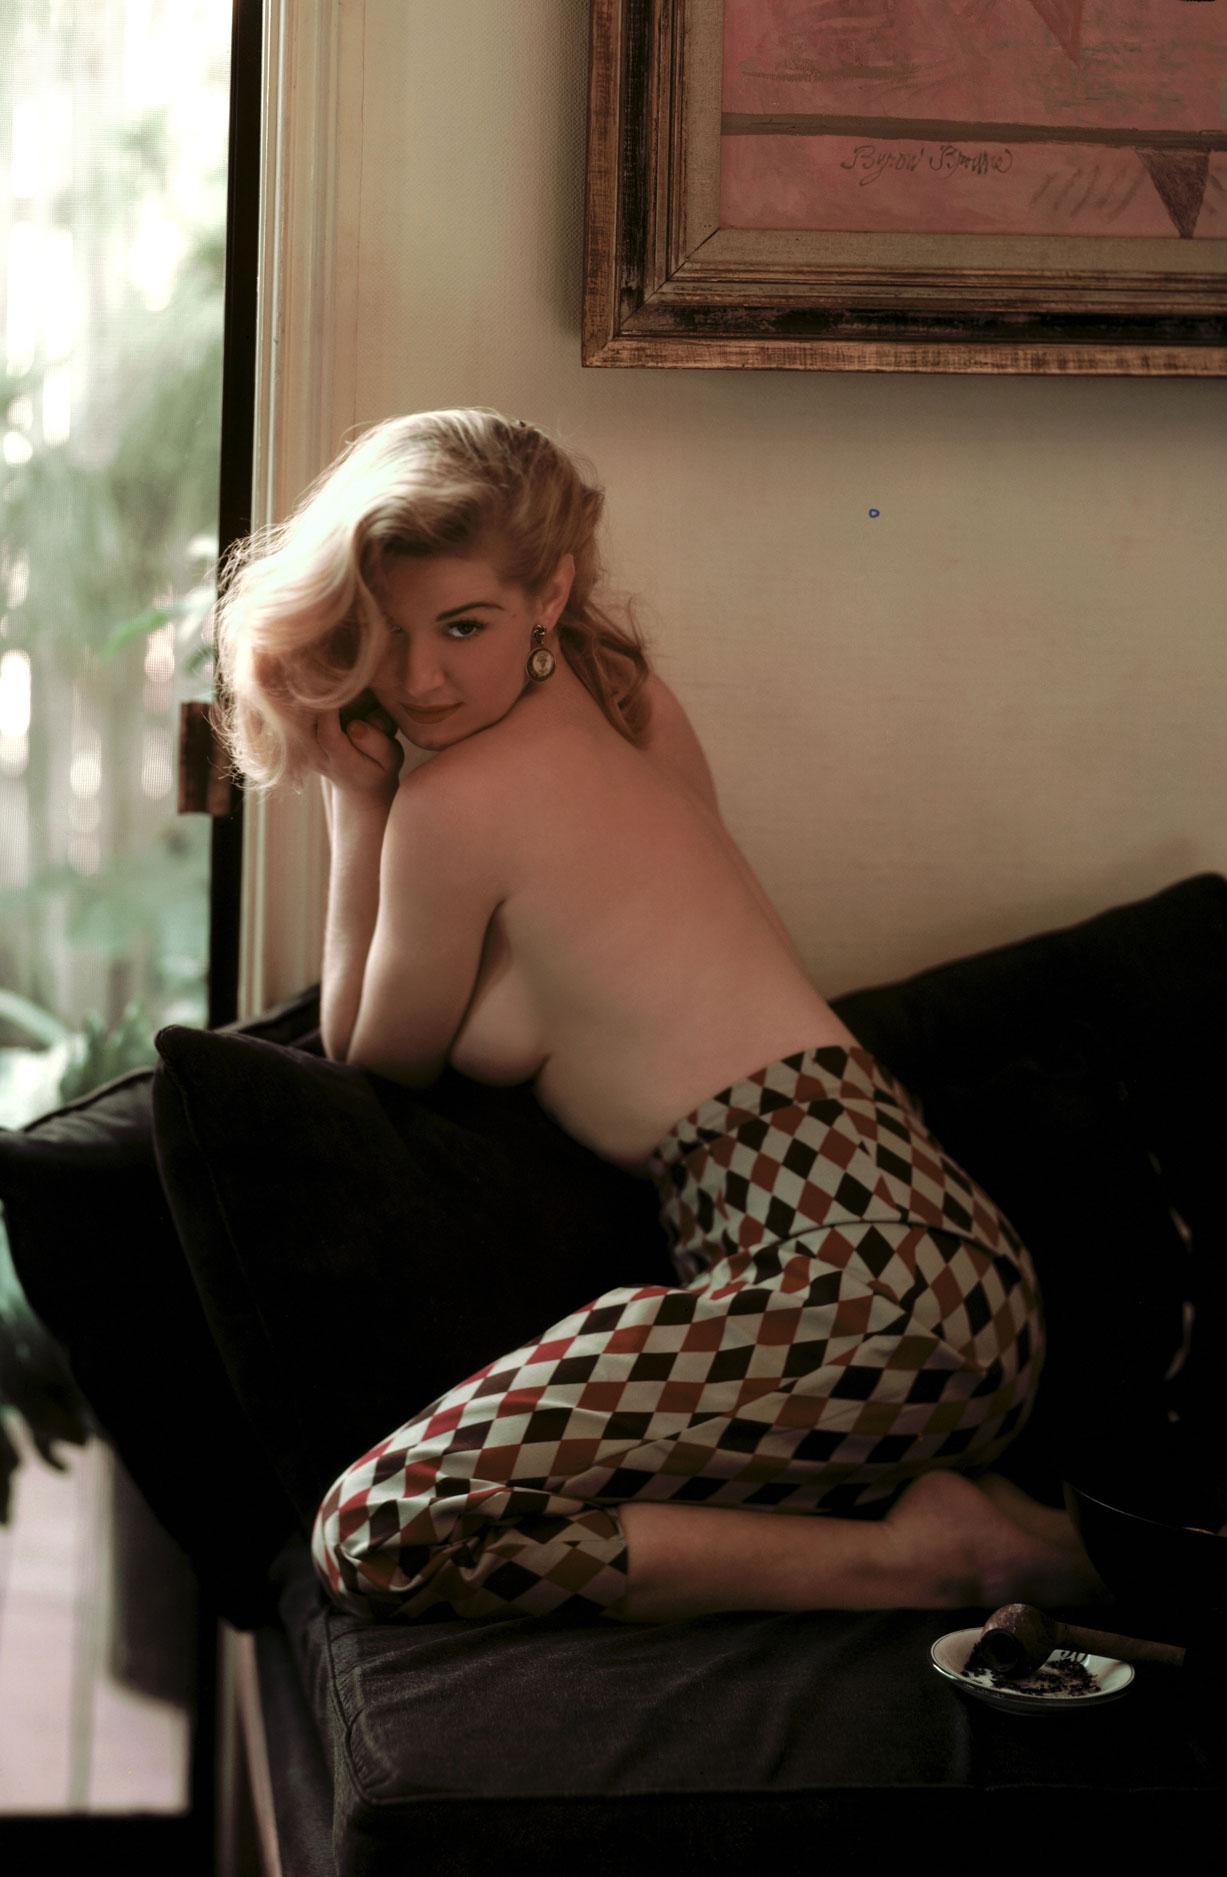 Playboy Playmate - Miss April 1955 | Marilyn Waltz / Мэрилин Валц